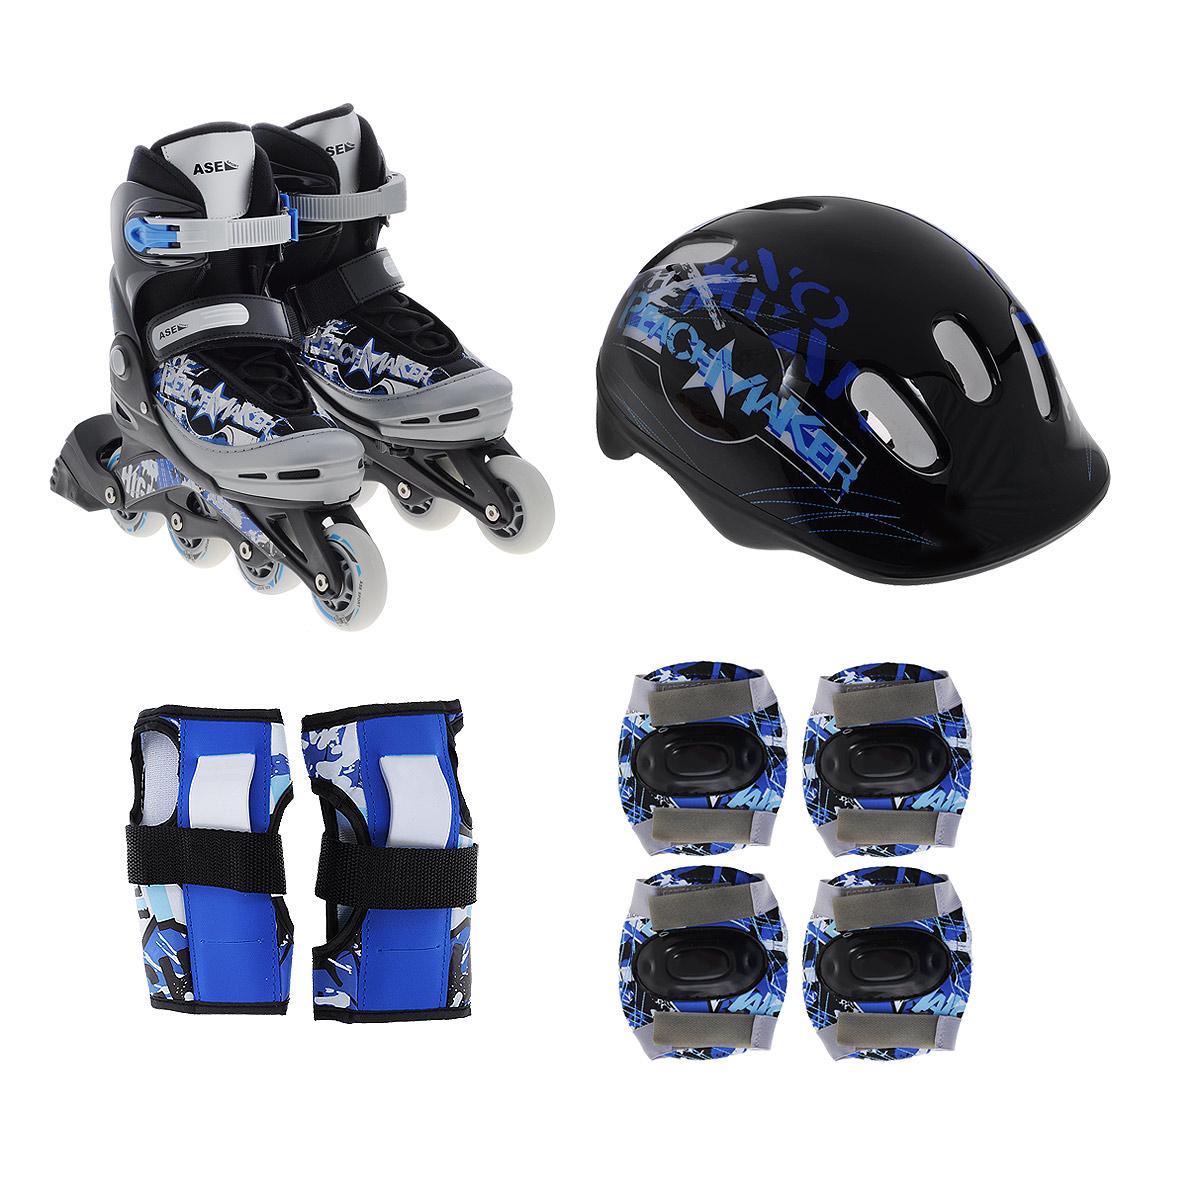 Комплект Ase-Sport Combo: коньки роликовые, шлем, защита, цвет: синий. ASE-617M. Размер M (34/37) COMBO ASE-617M